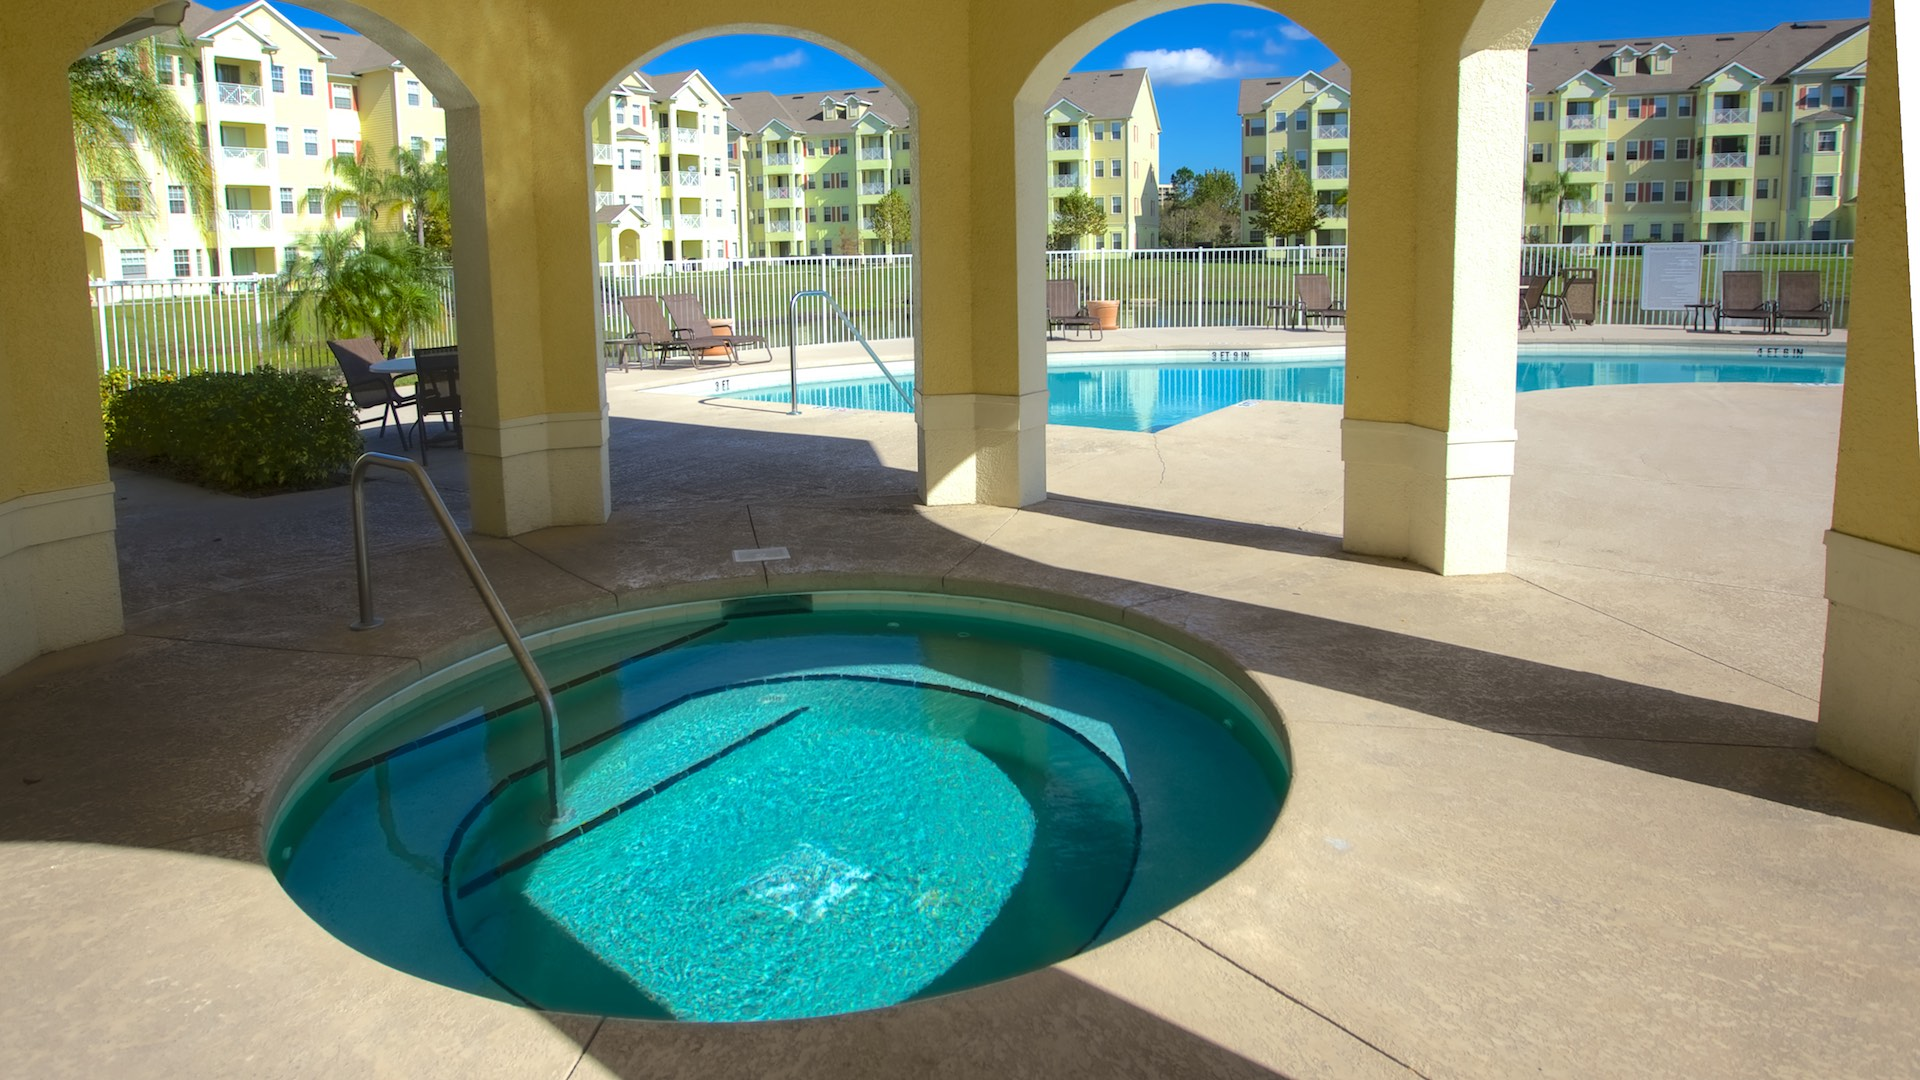 Apartment Cayman Condo at Cane Island Resort photo 20307692